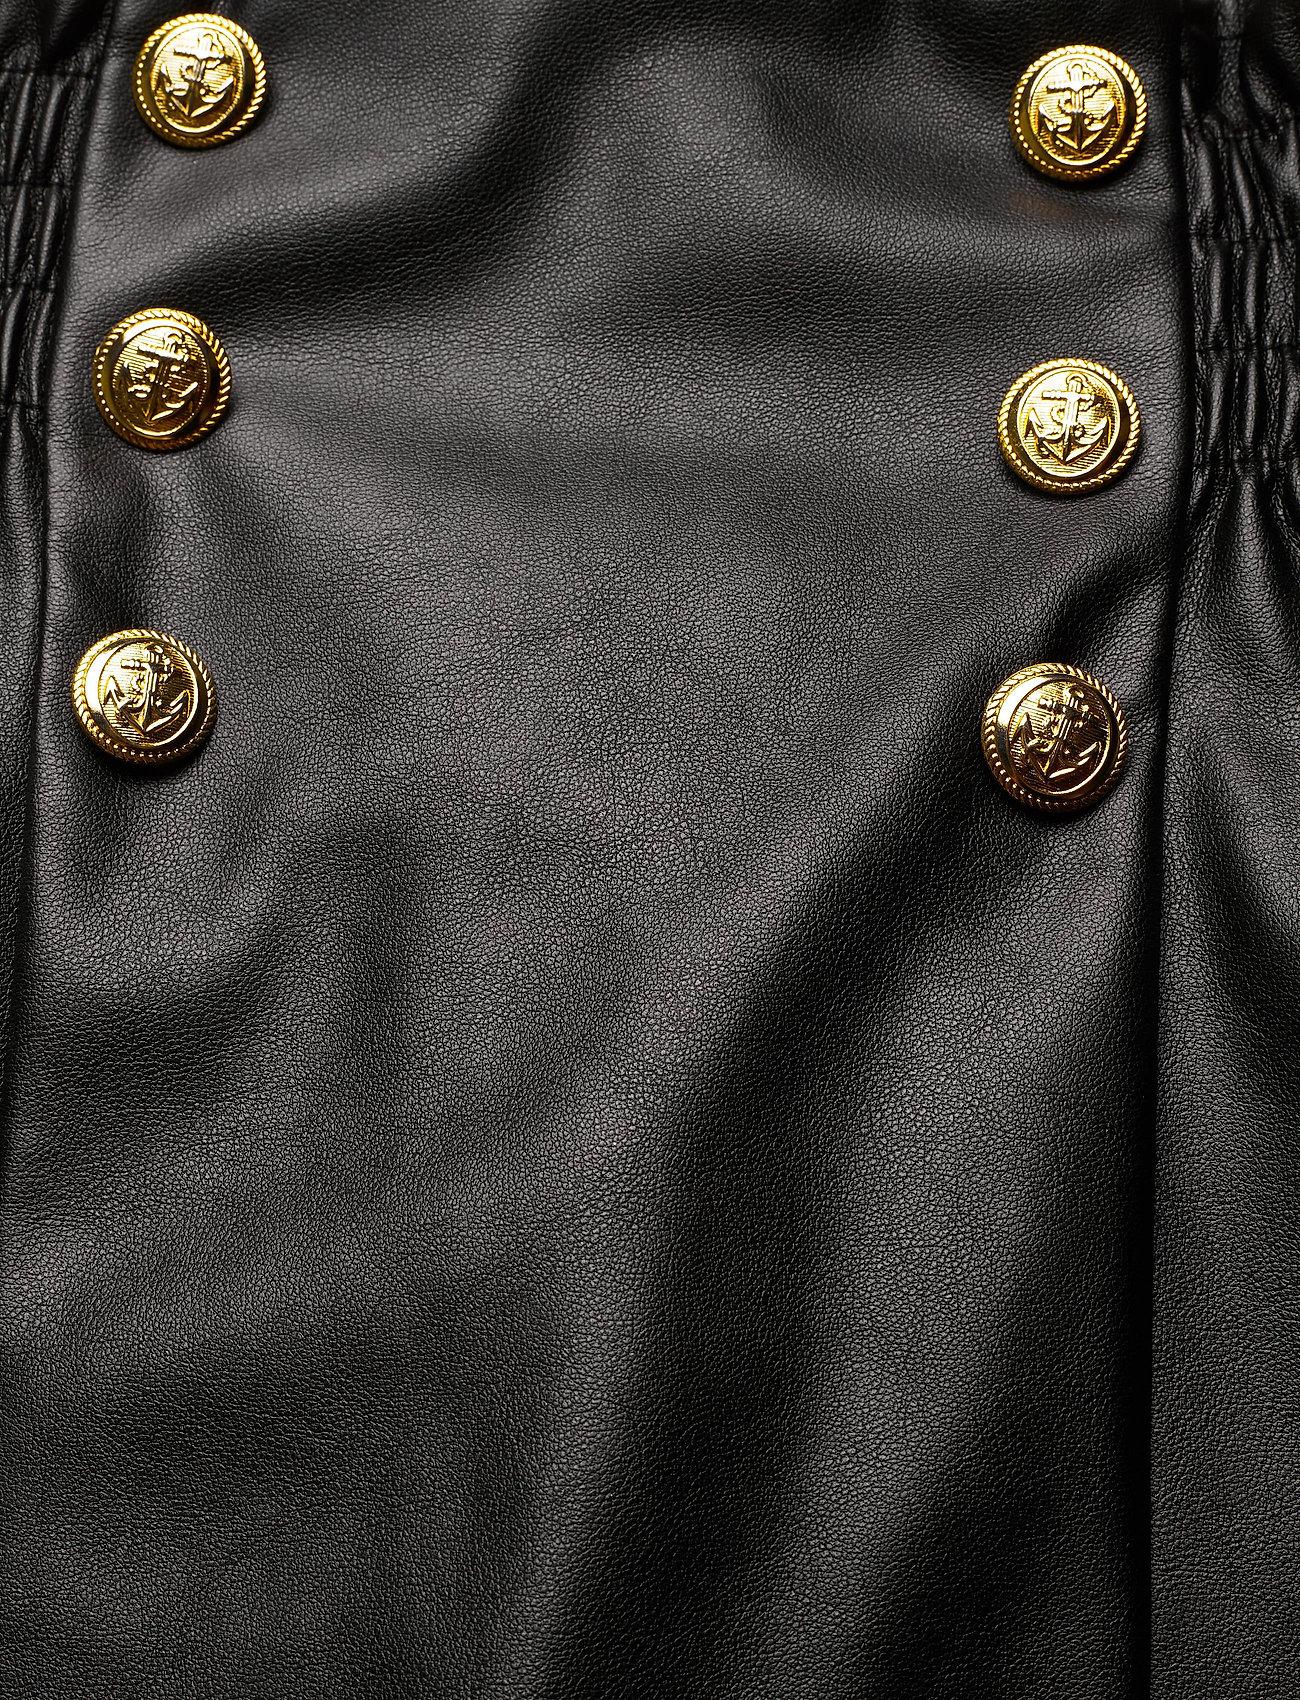 Keeley Skirt (Black) (118.30 €) - Ida Sjöstedt xVtEp